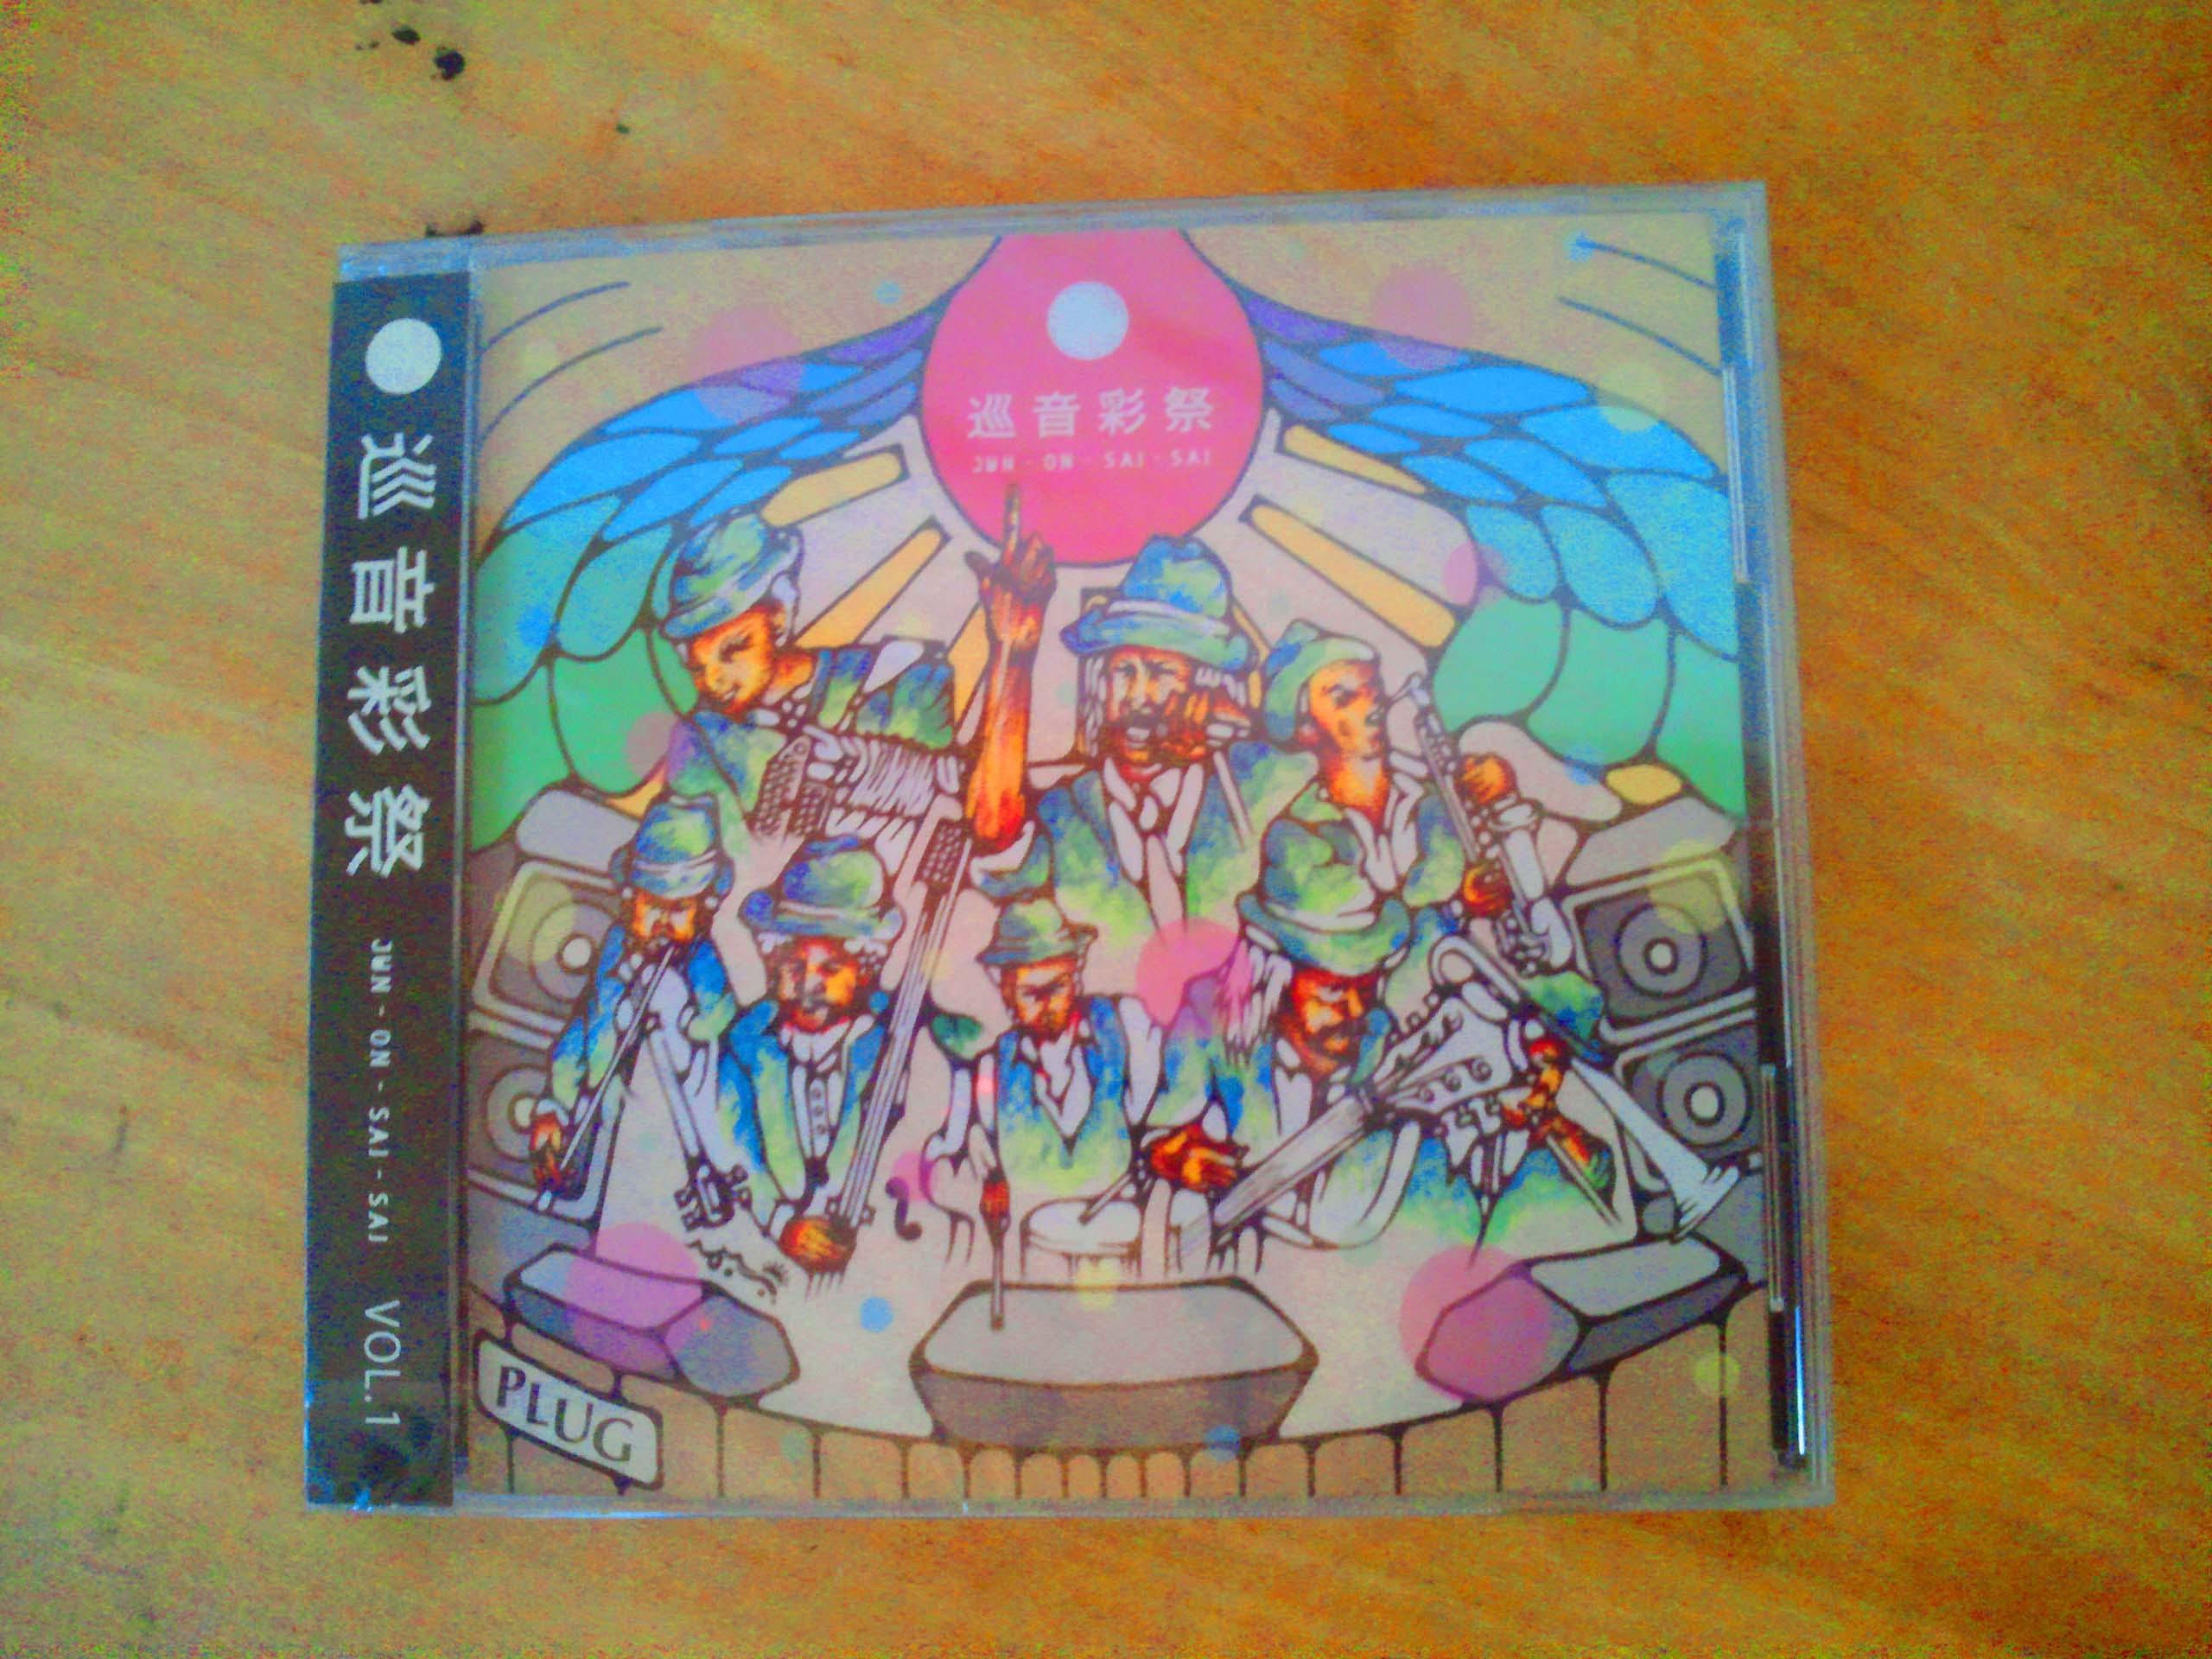 CD購入そして決意!_d0233728_16404475.jpg